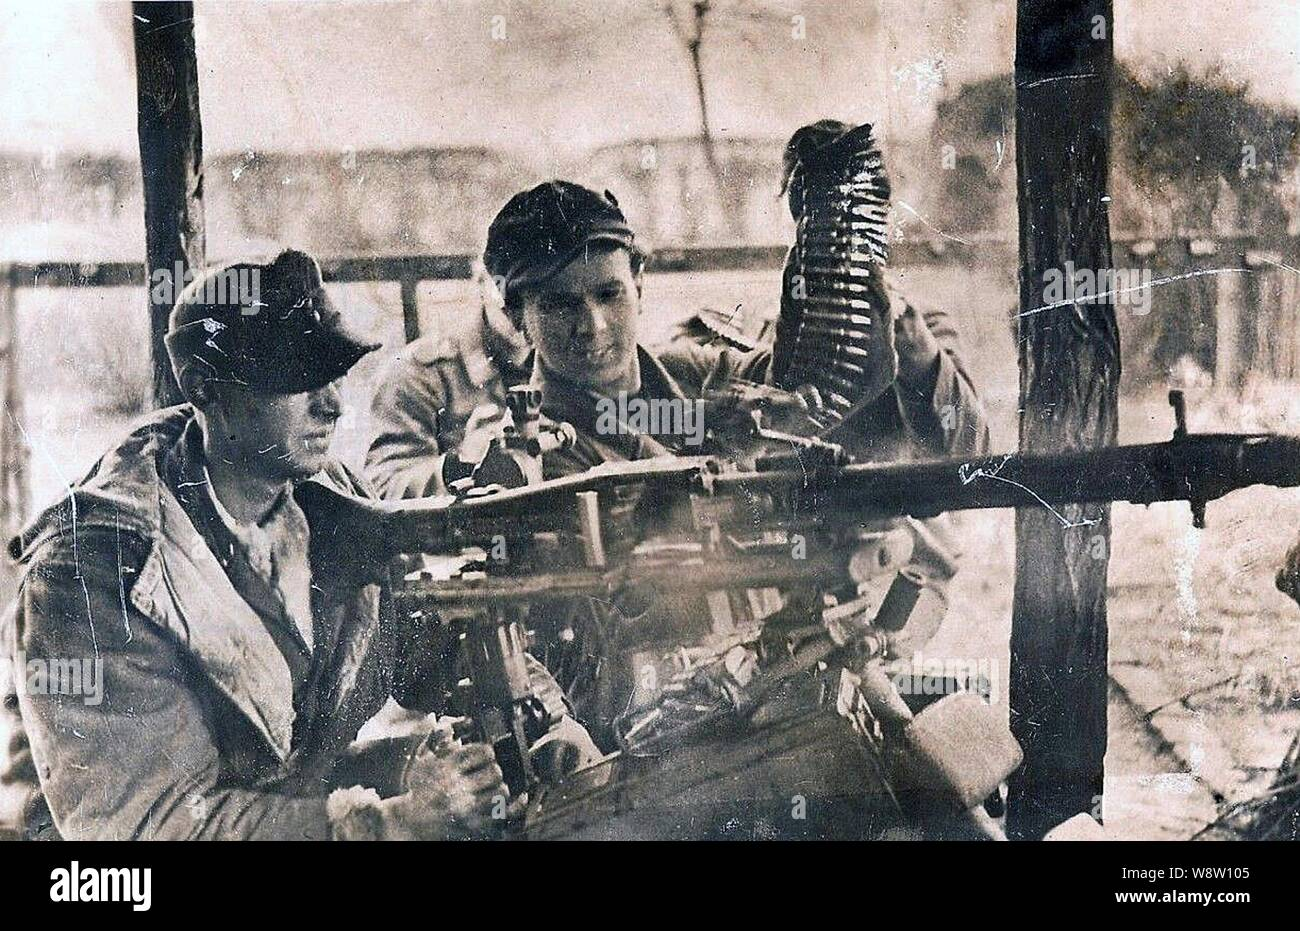 German Machine Guns 1945 Stock Photos & German Machine Guns